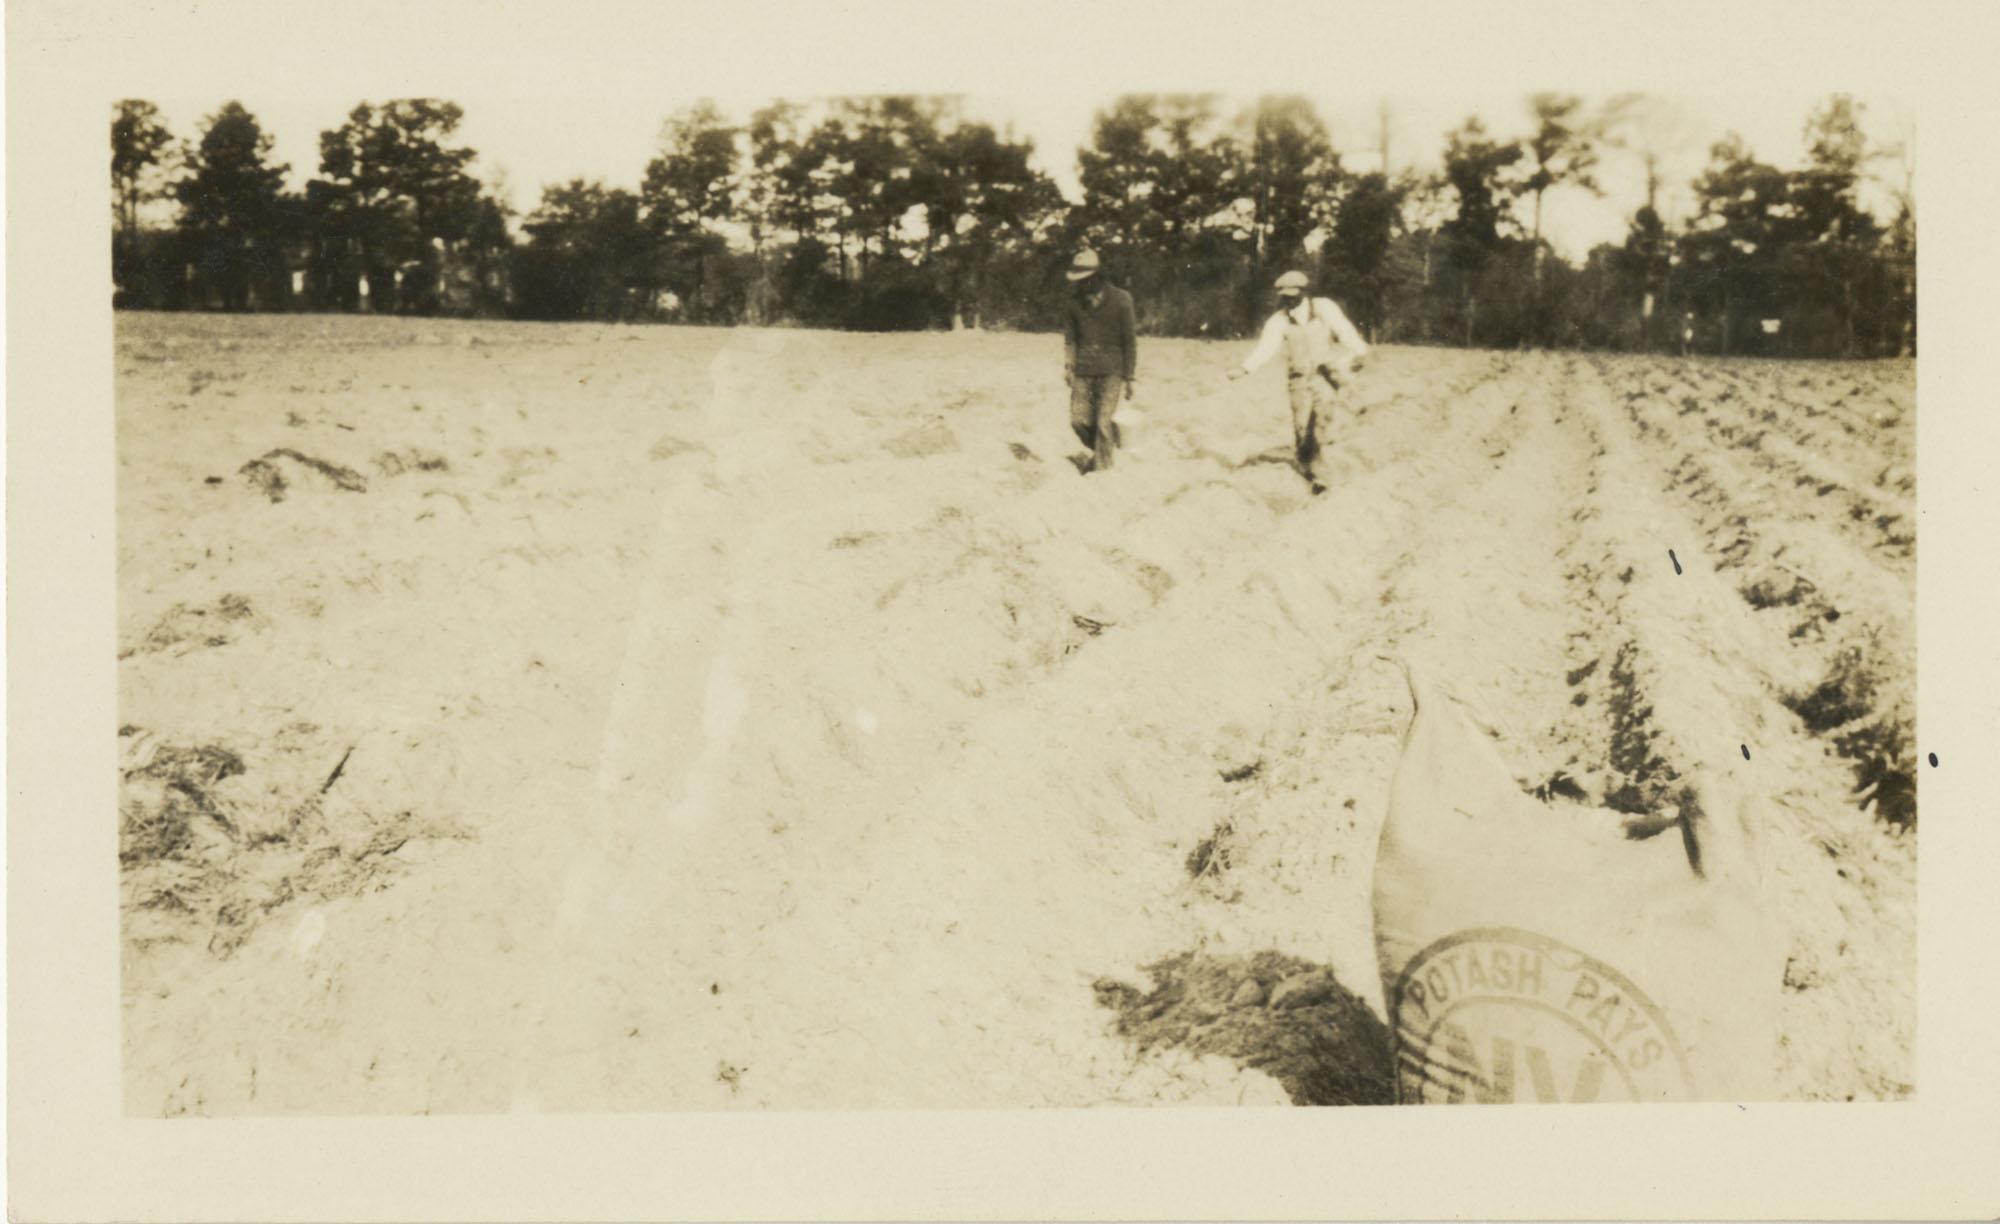 Laborers